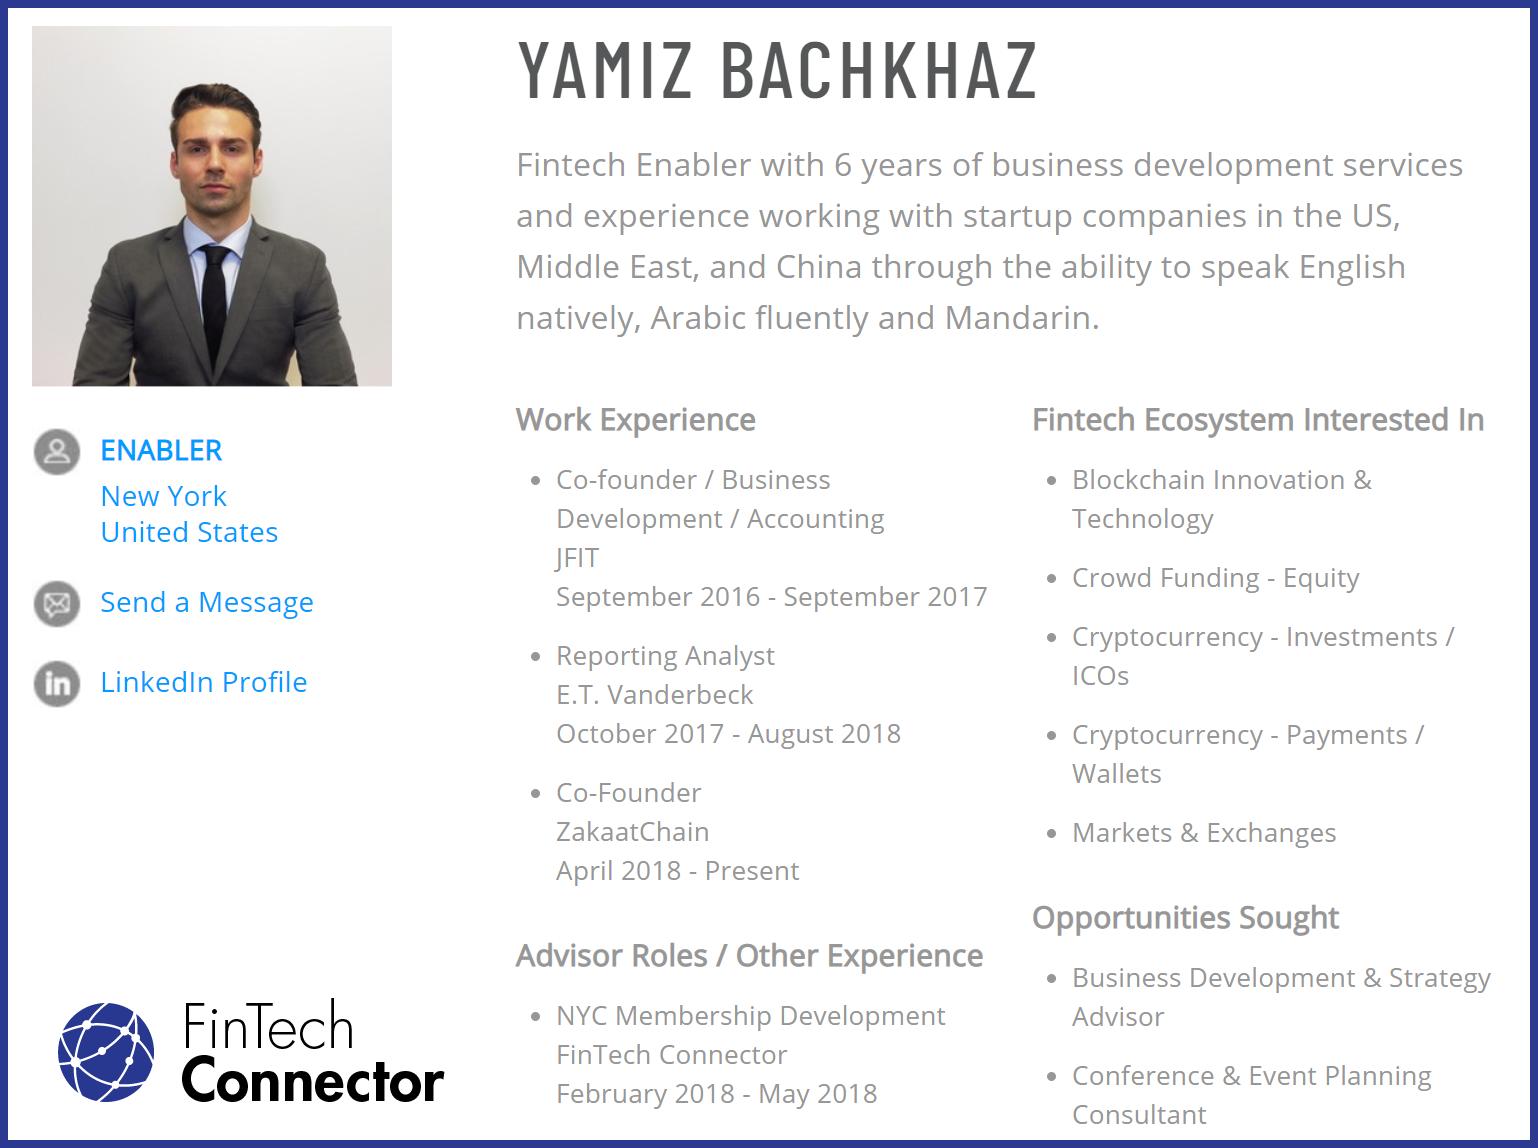 Connect with Yamiz Bachkhaz via FinTech Connector